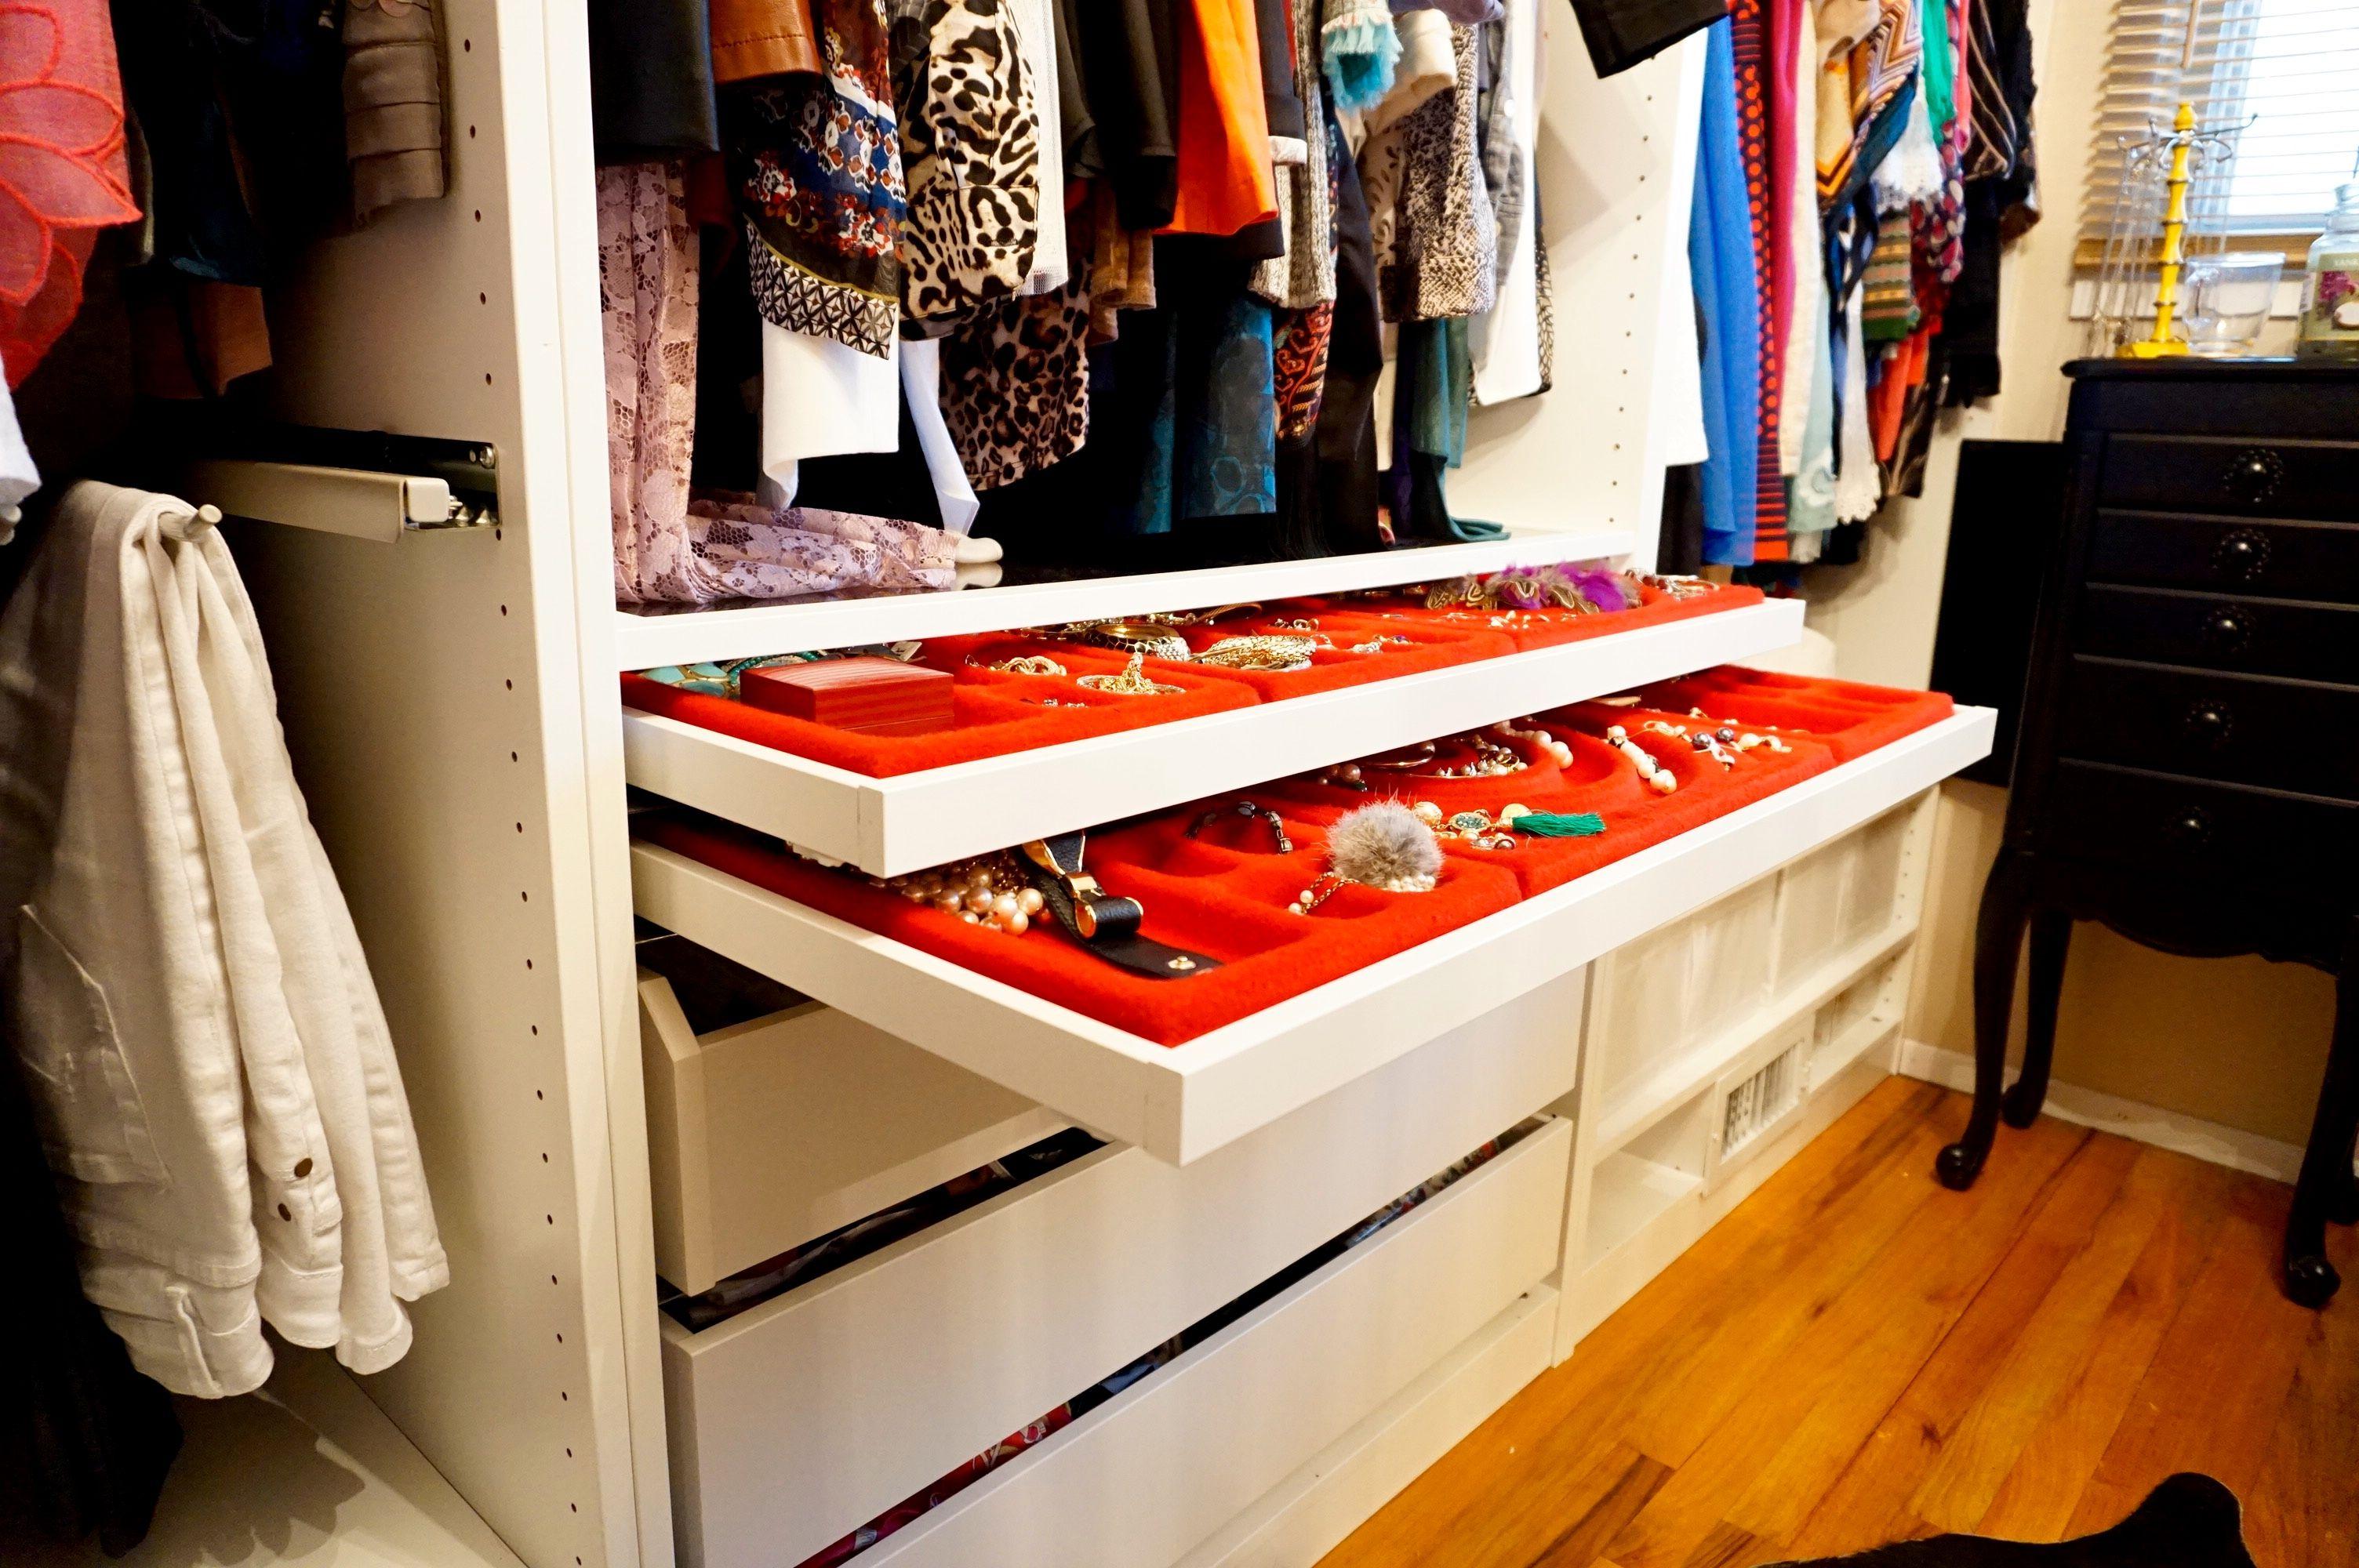 Ikea Pax Closet System Review